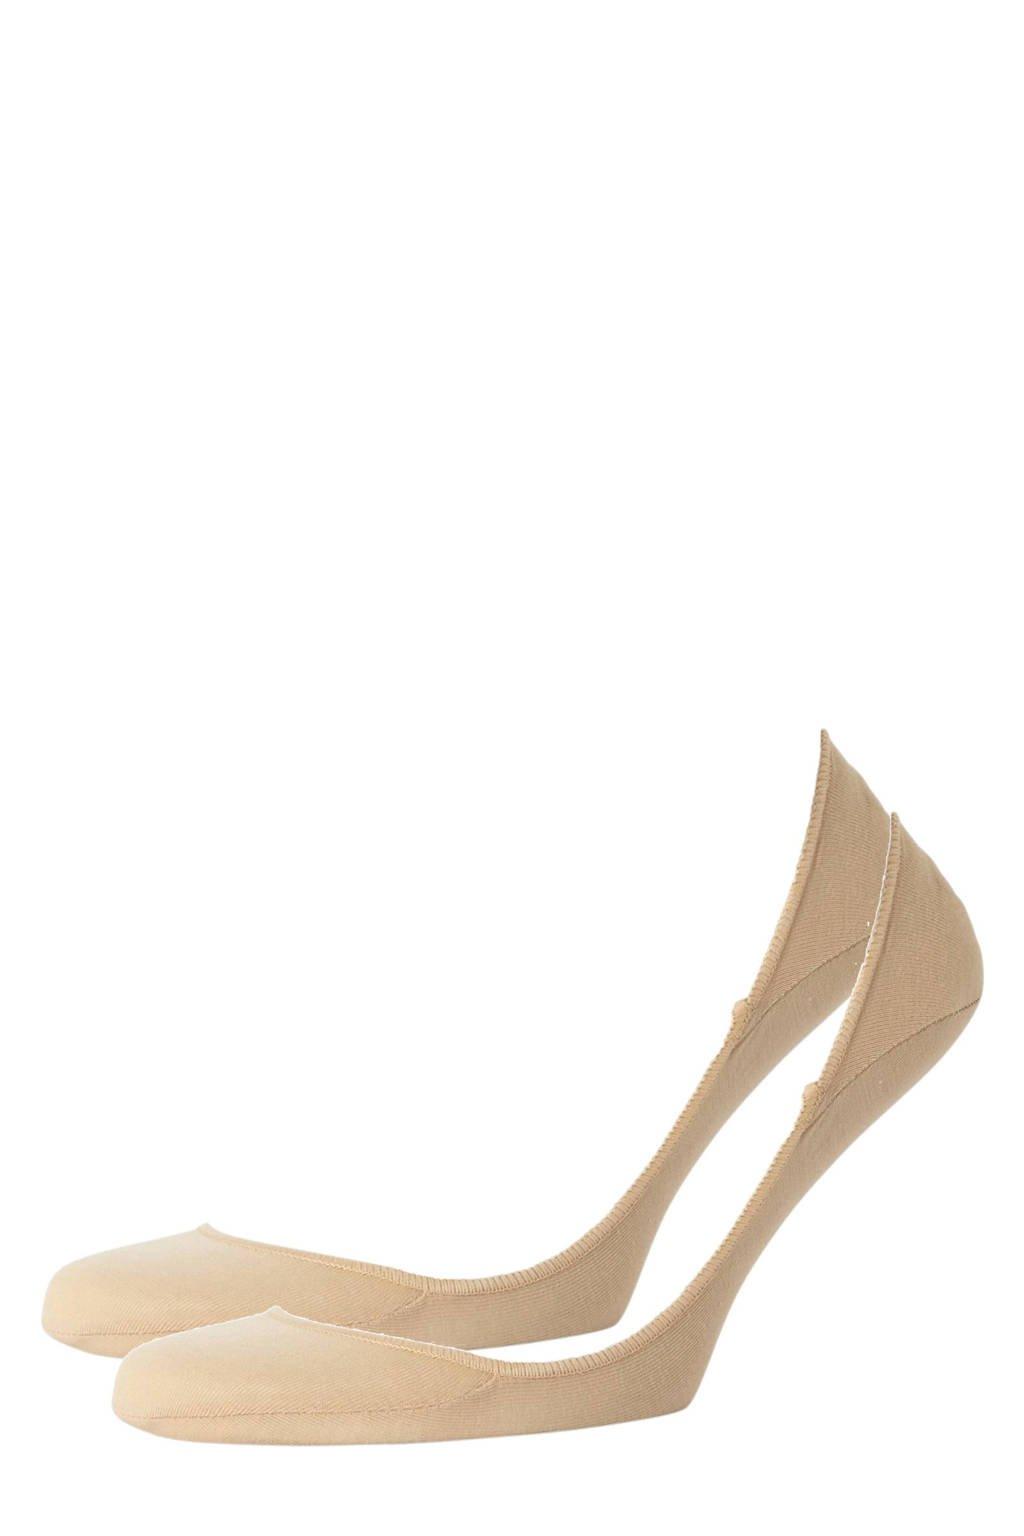 CALVIN KLEIN kousenvoetjes - 2 paar, Beige